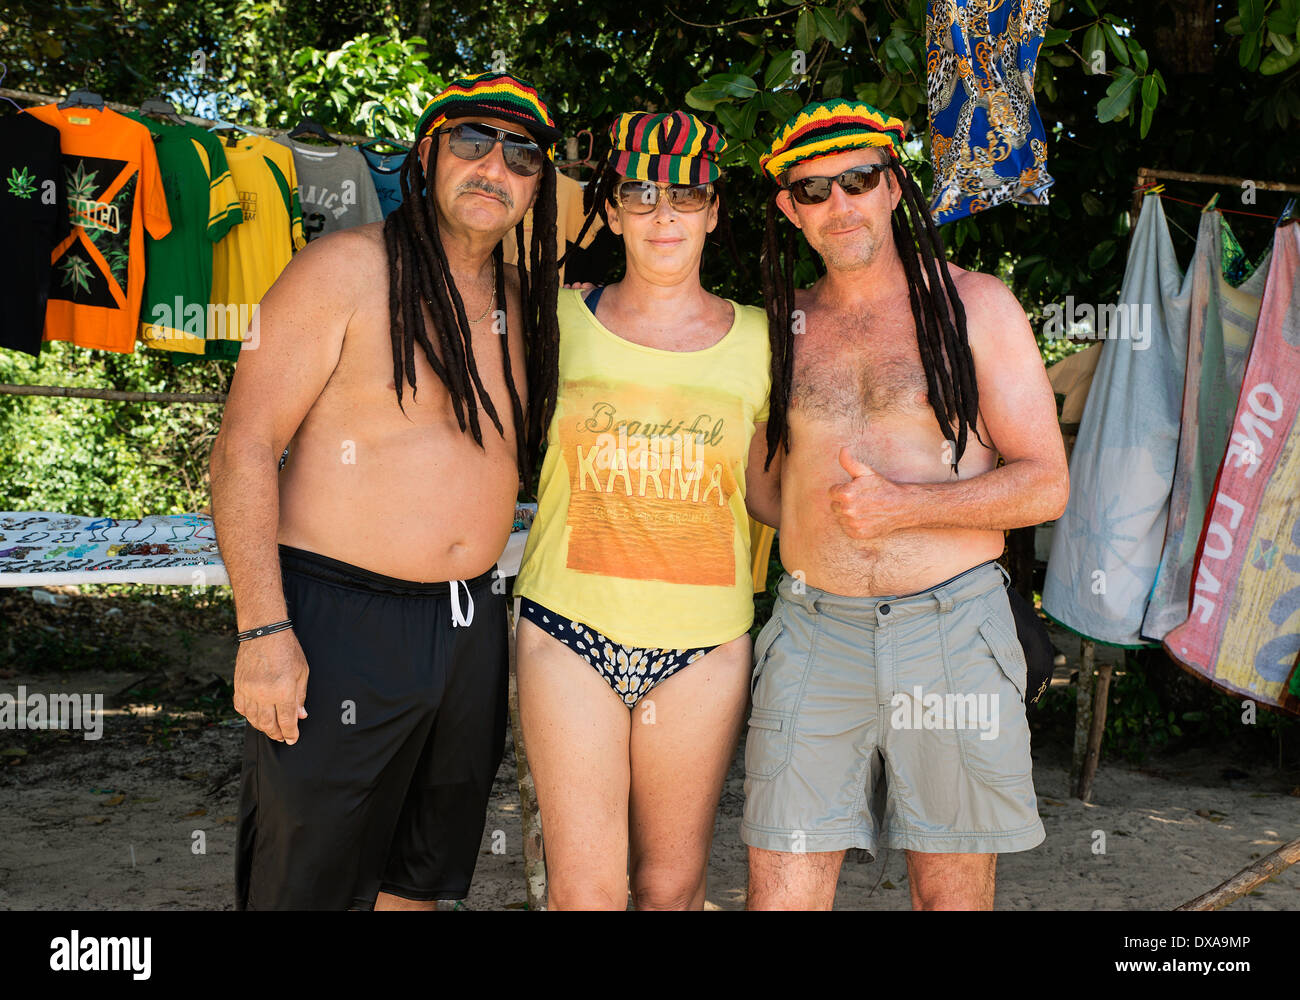 Tourist friends model dreadlock Jamaican hats on the beach, Negril, Jamaica - Stock Image